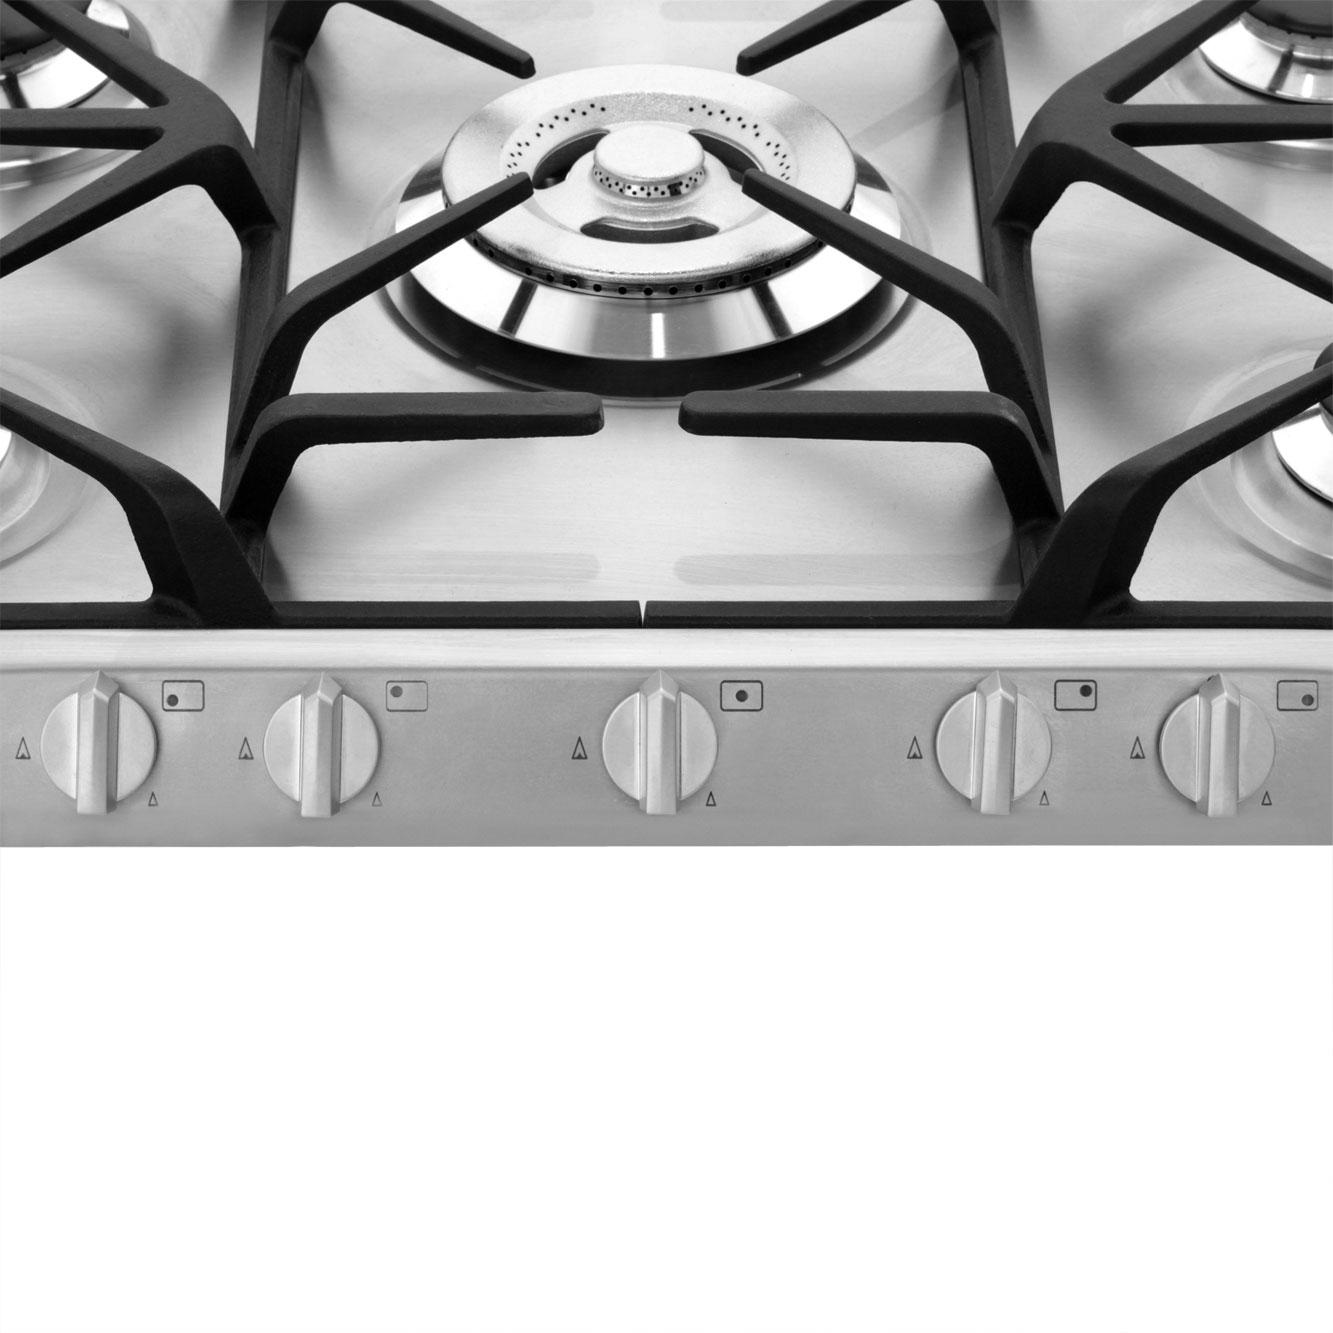 SMEG Cucina SR275XGH Gas Hob - Stainless Steel 8017709179489 | eBay